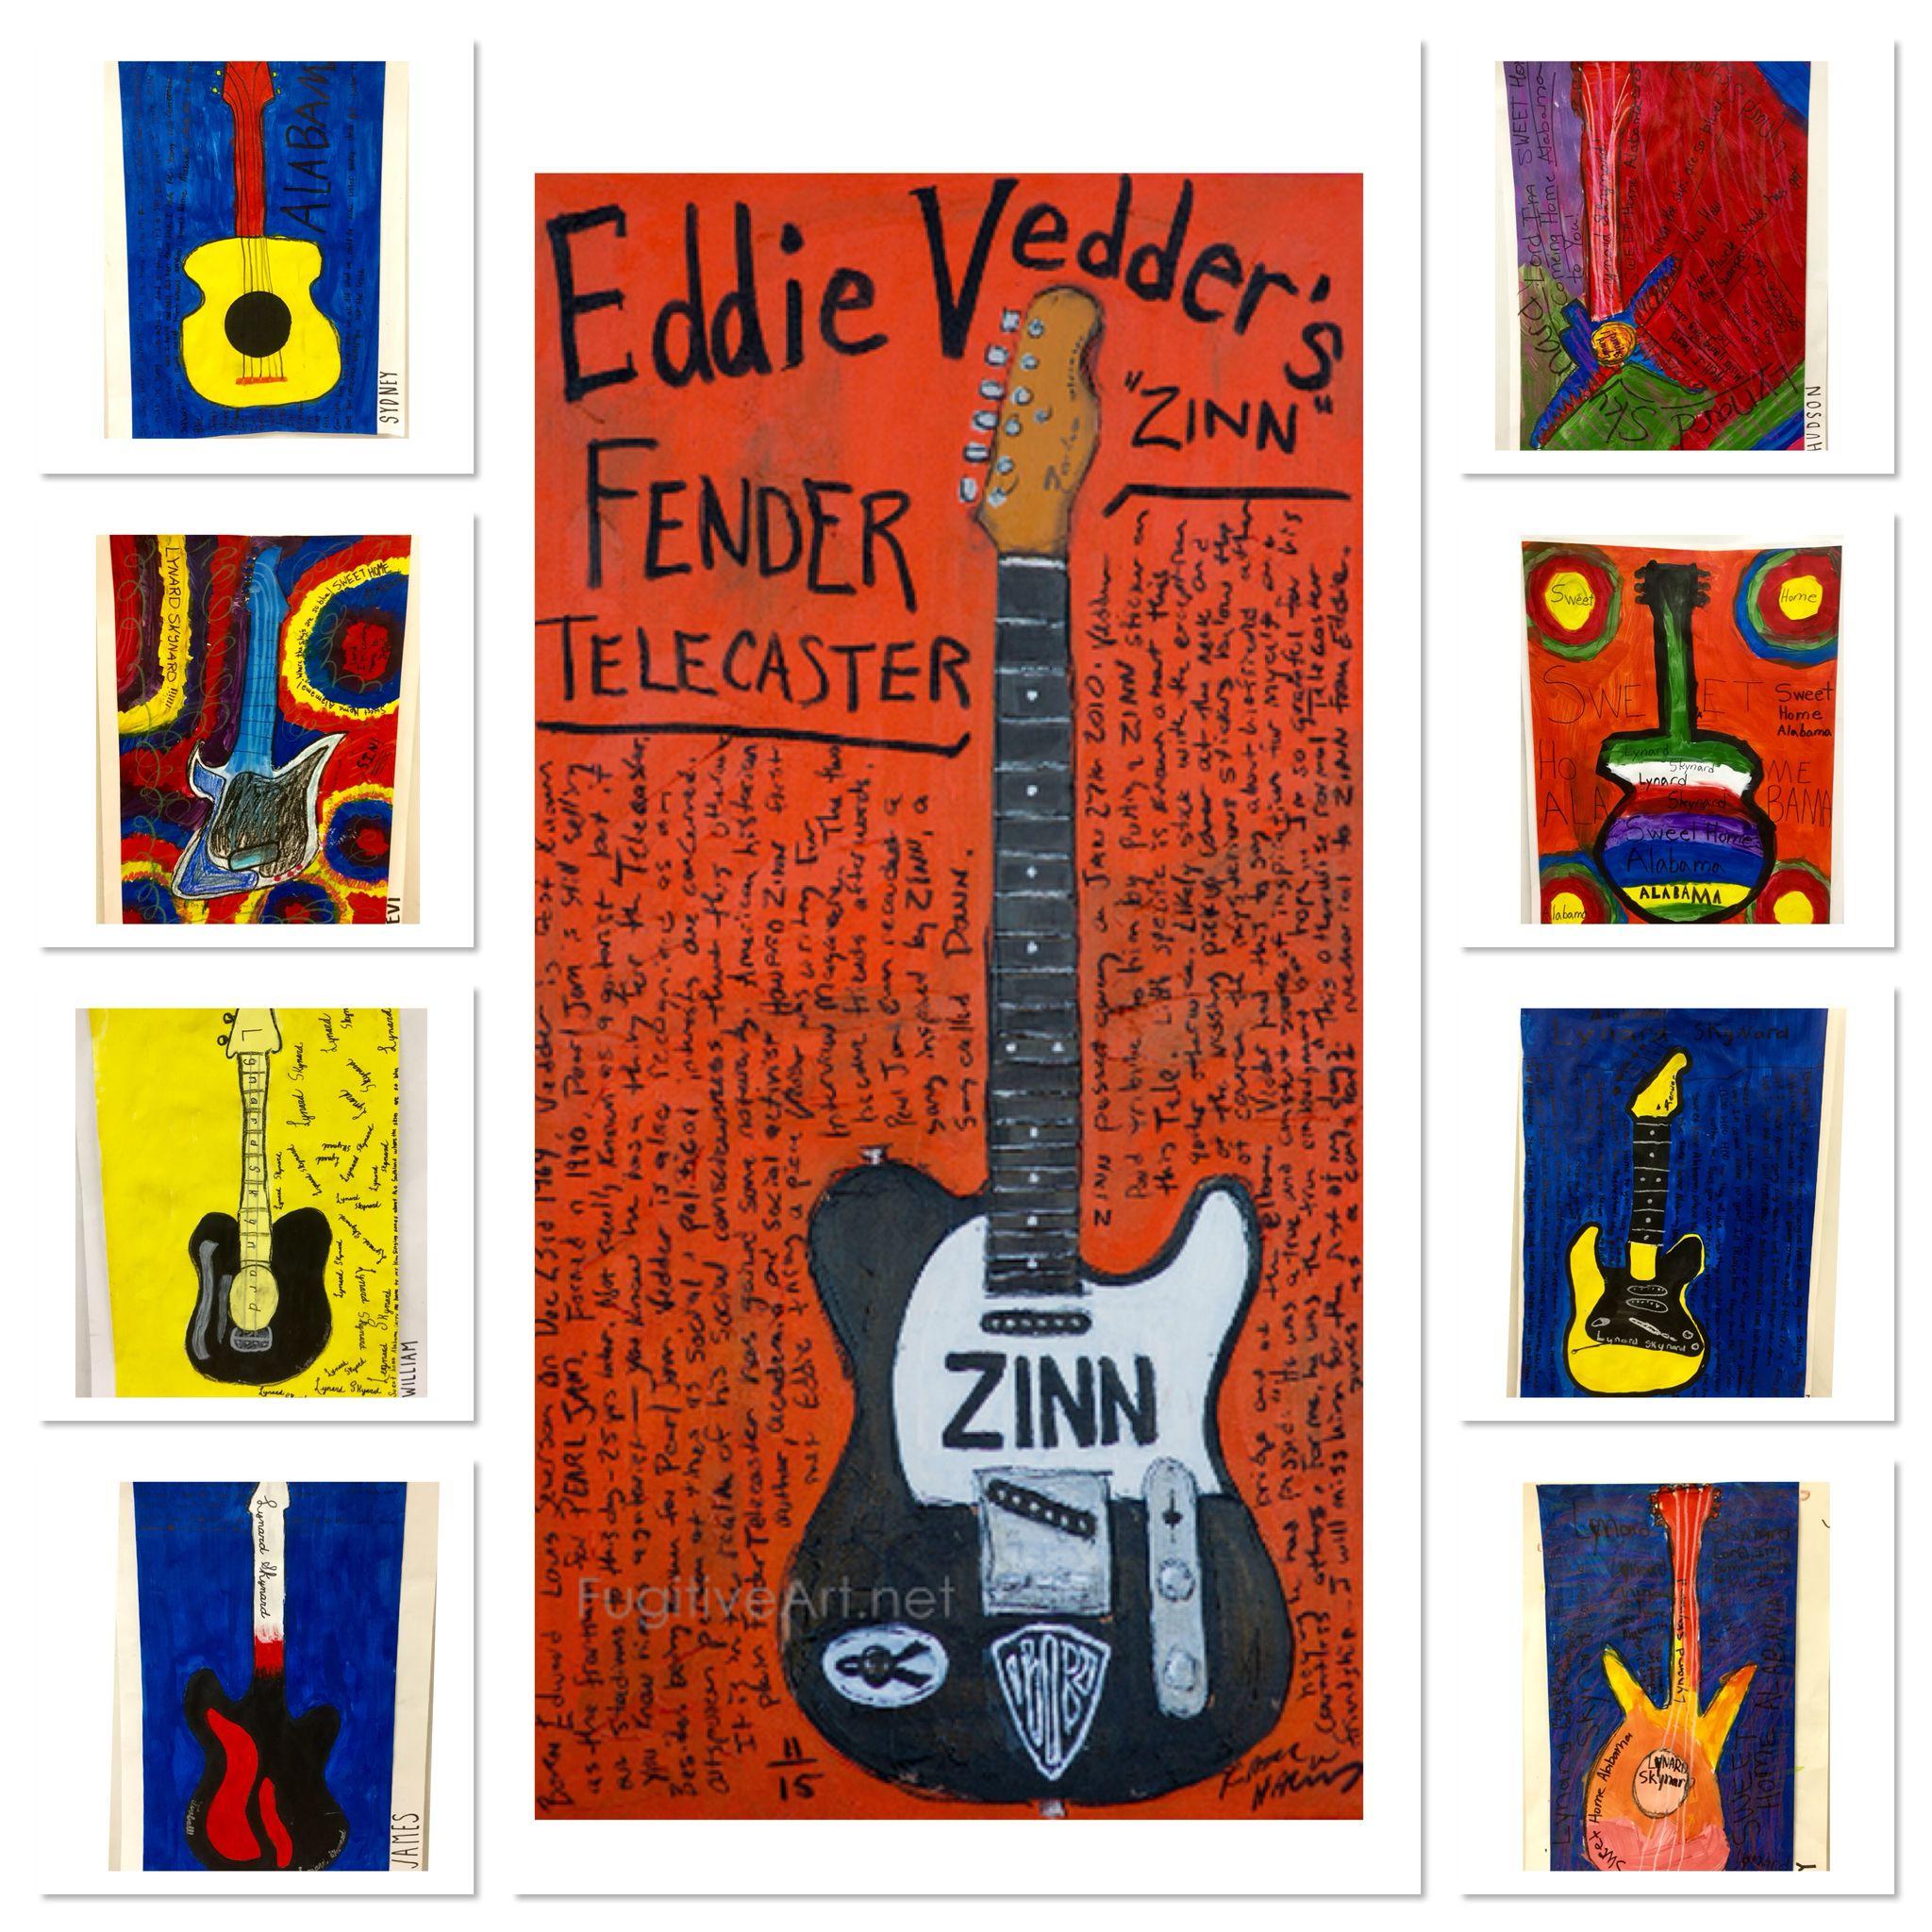 5th Grade Karl Haglund guitars-http://2soulsisters.blogspot.com/2016/03/grandparents-guitars-karl-and-eddie.html